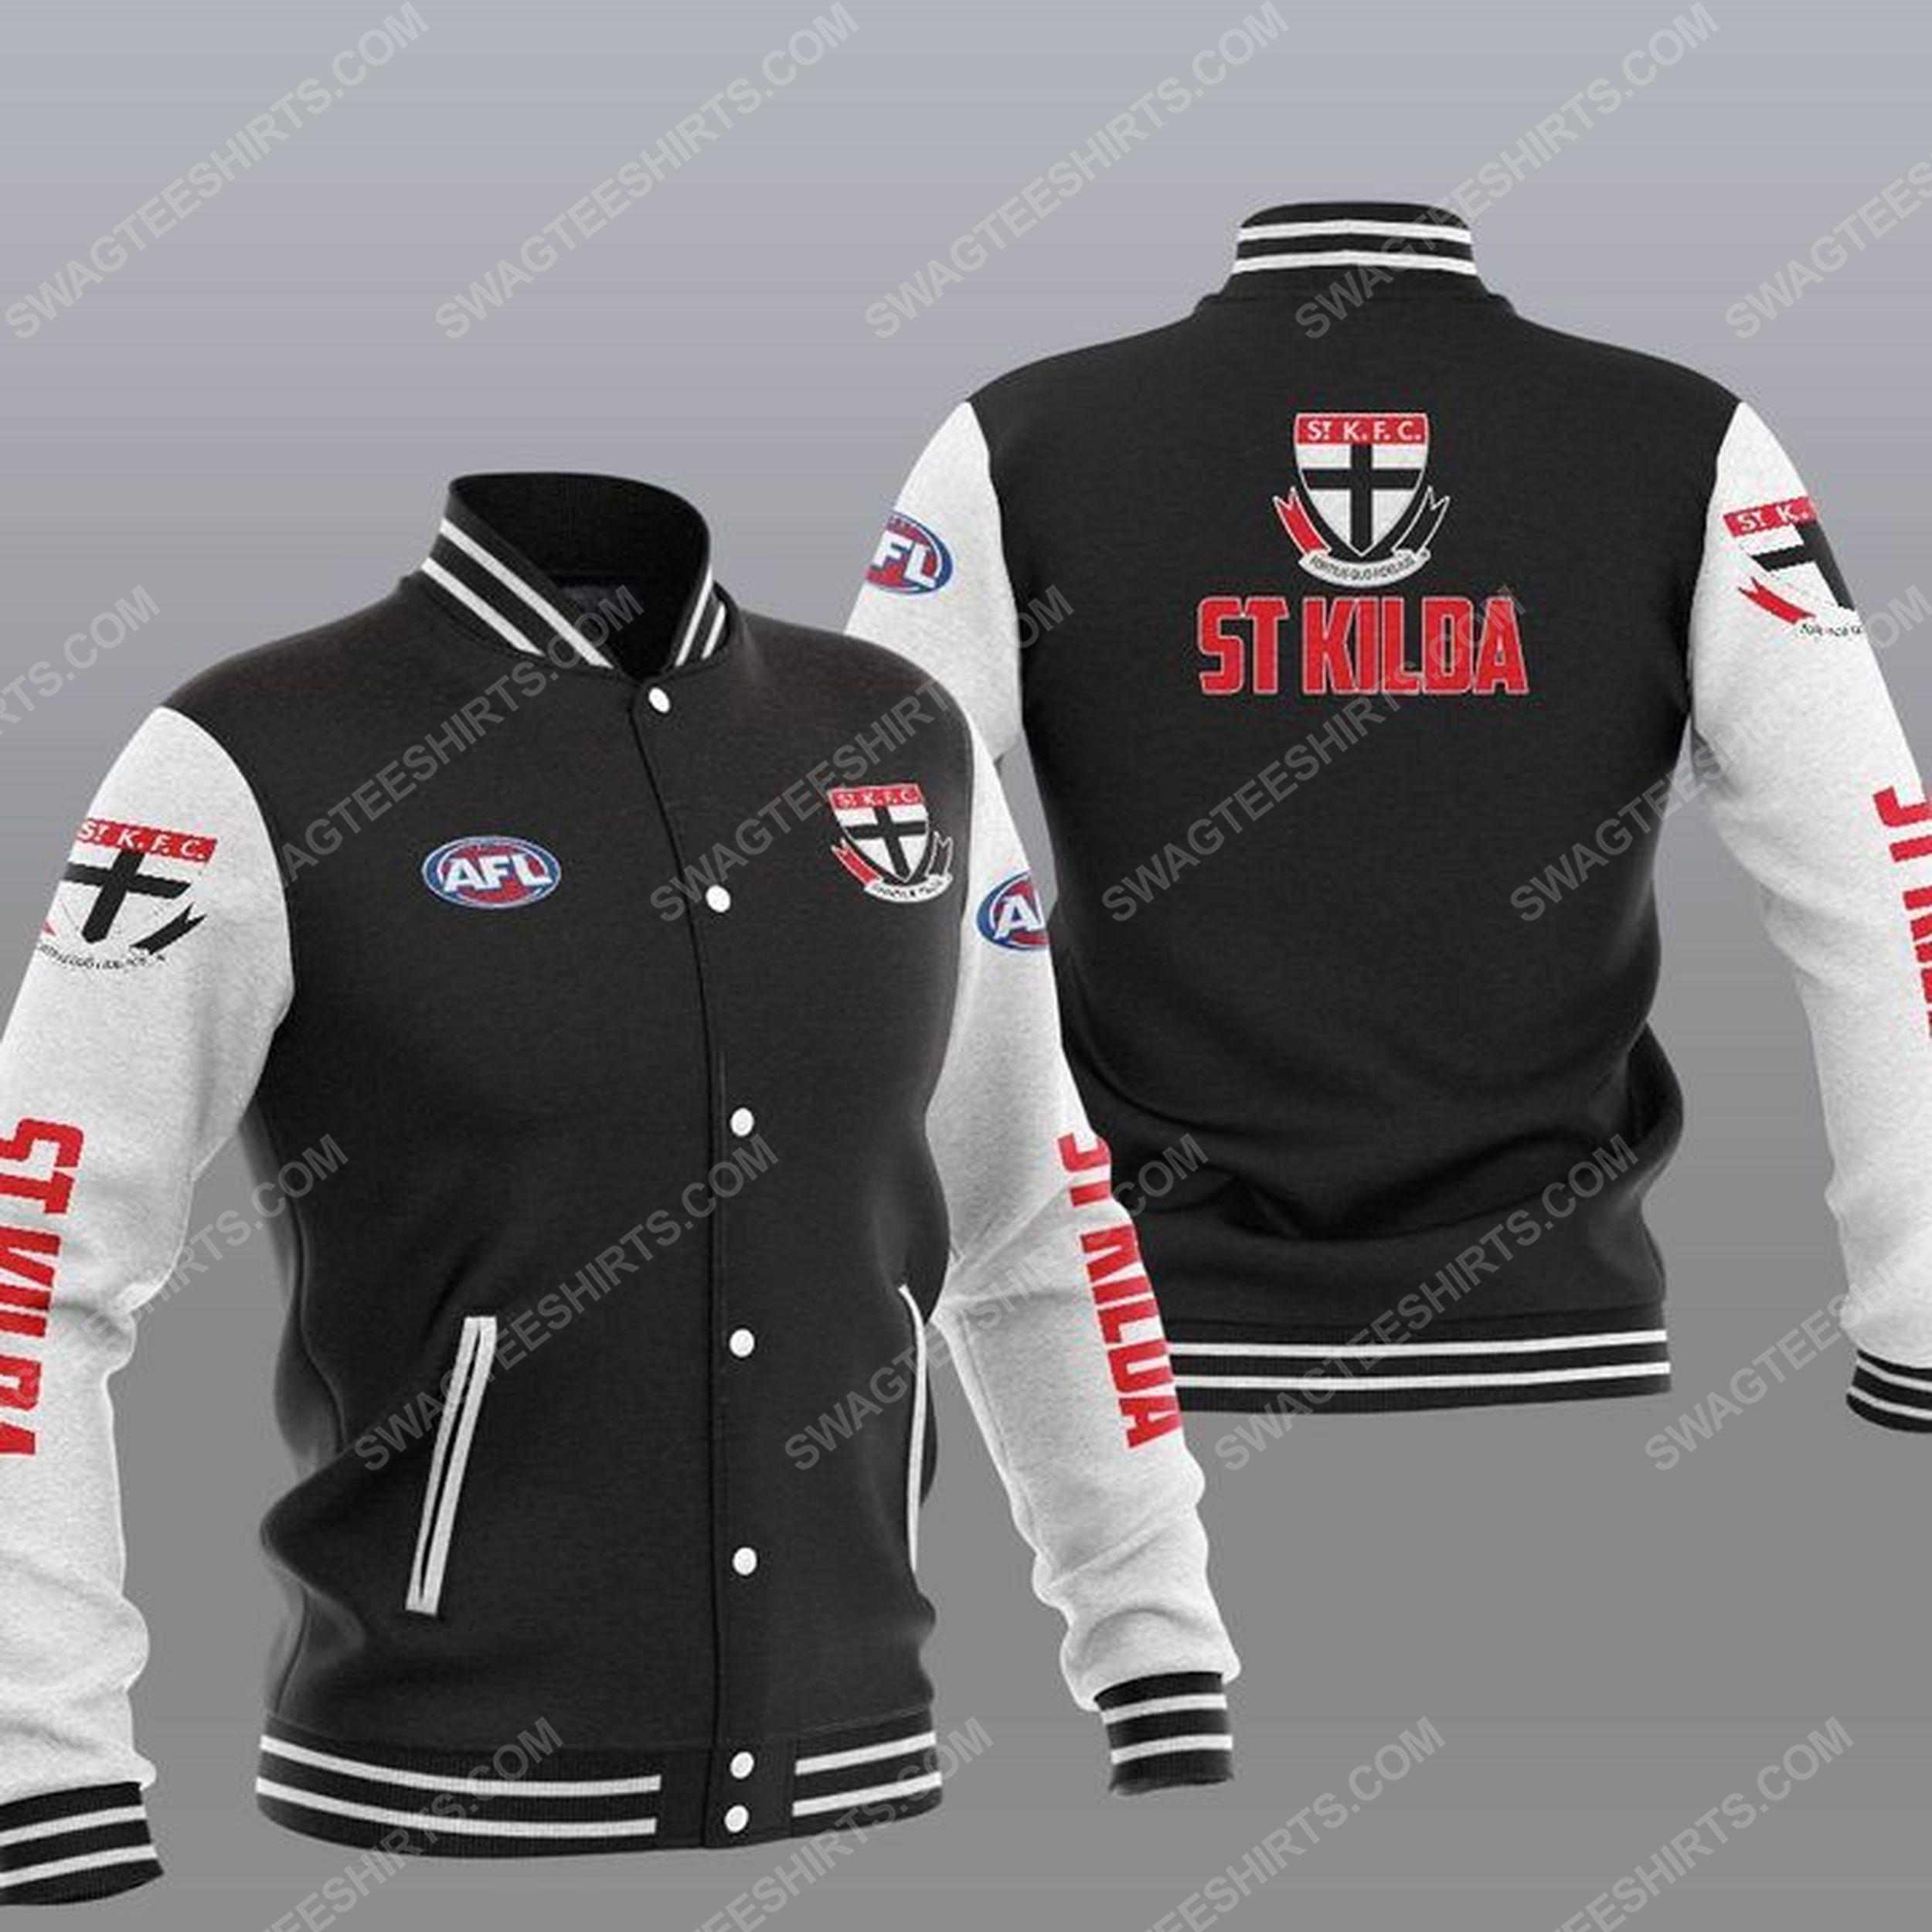 The st kilda football club all over print baseball jacket - black 1